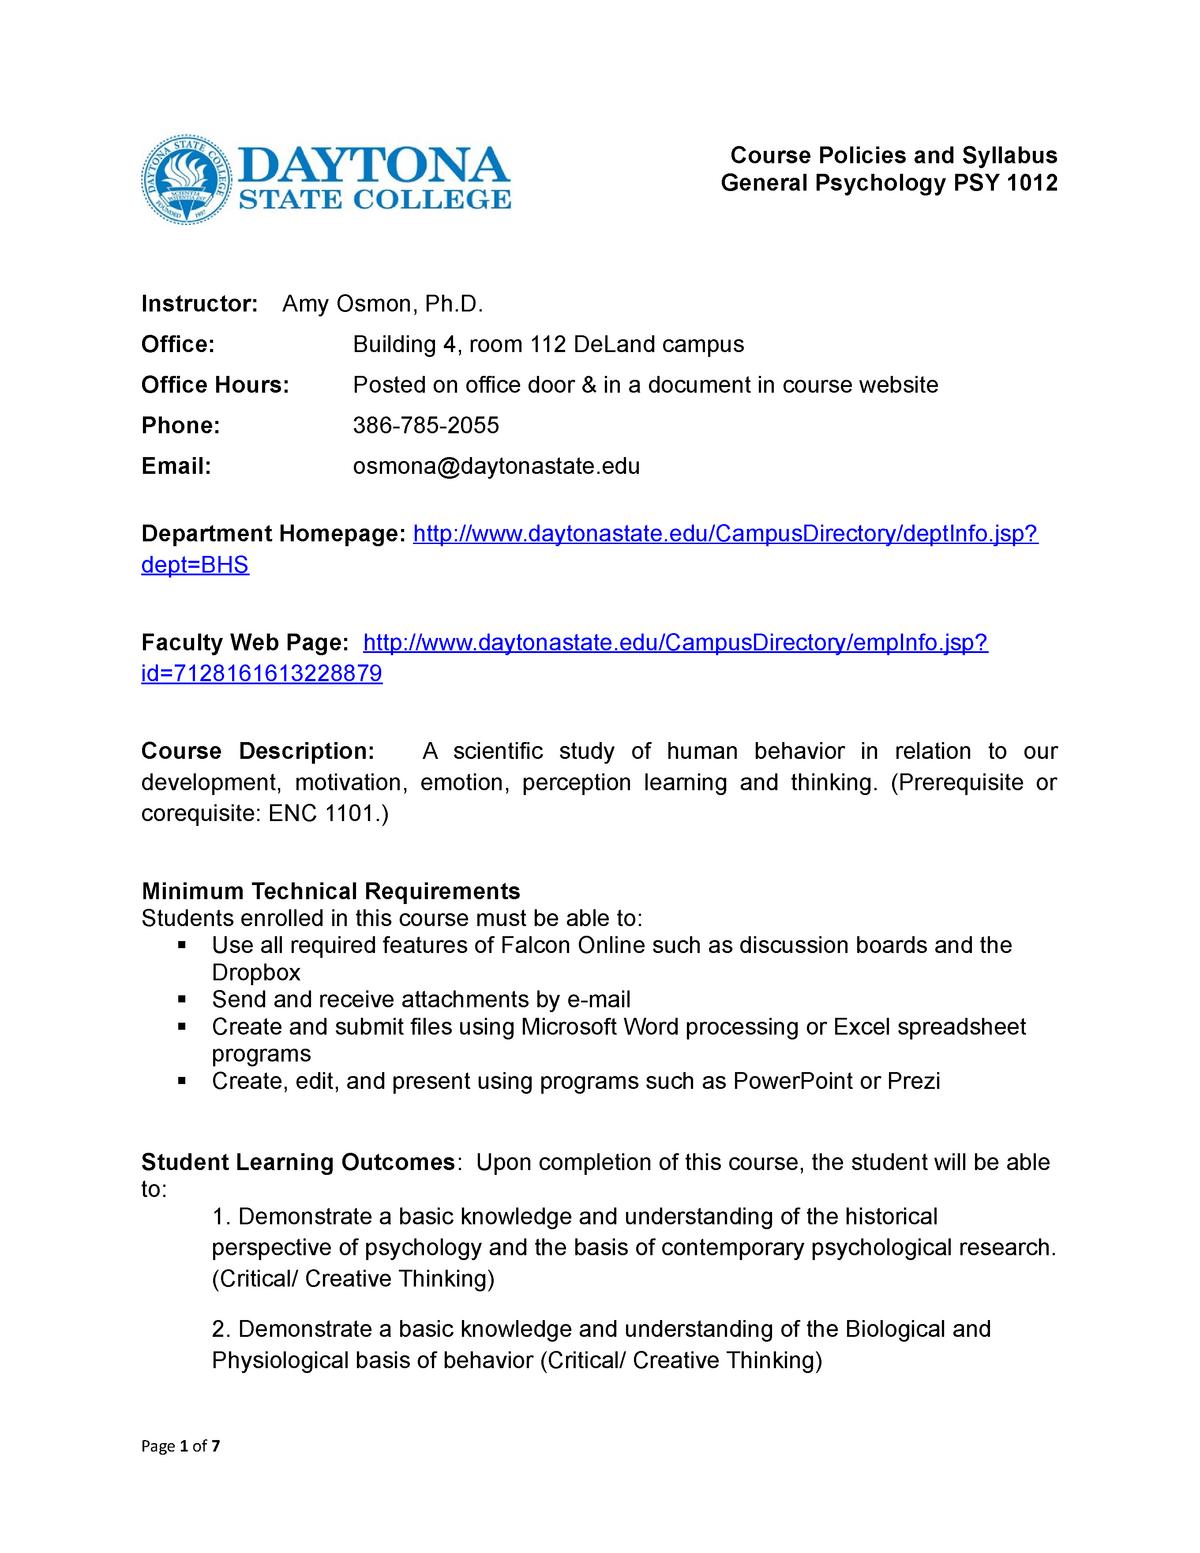 PSY1012 FA15 - Lecture notes Syllabi - PSY1012: General Psychology